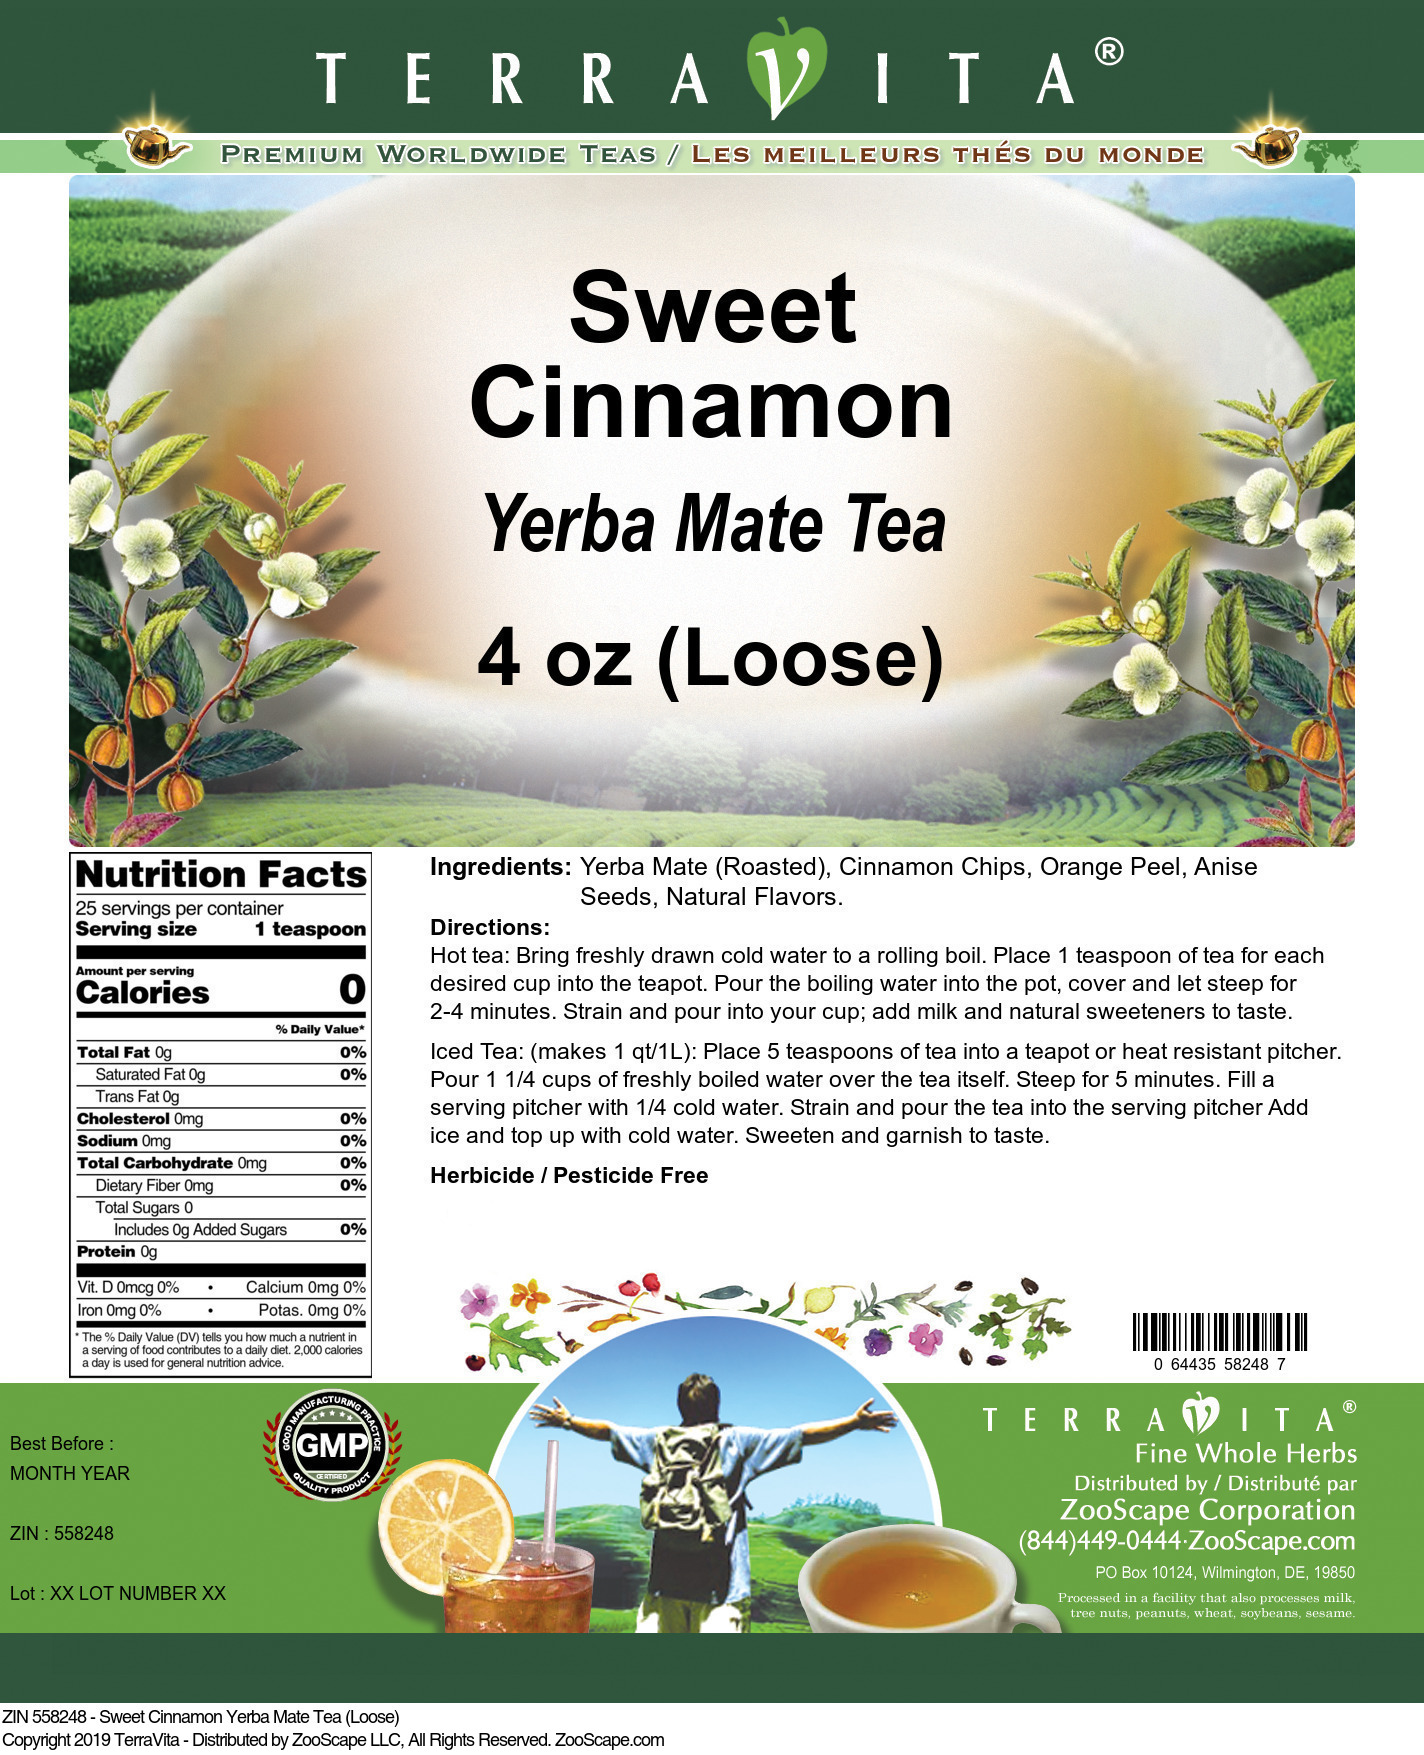 Sweet Cinnamon Yerba Mate